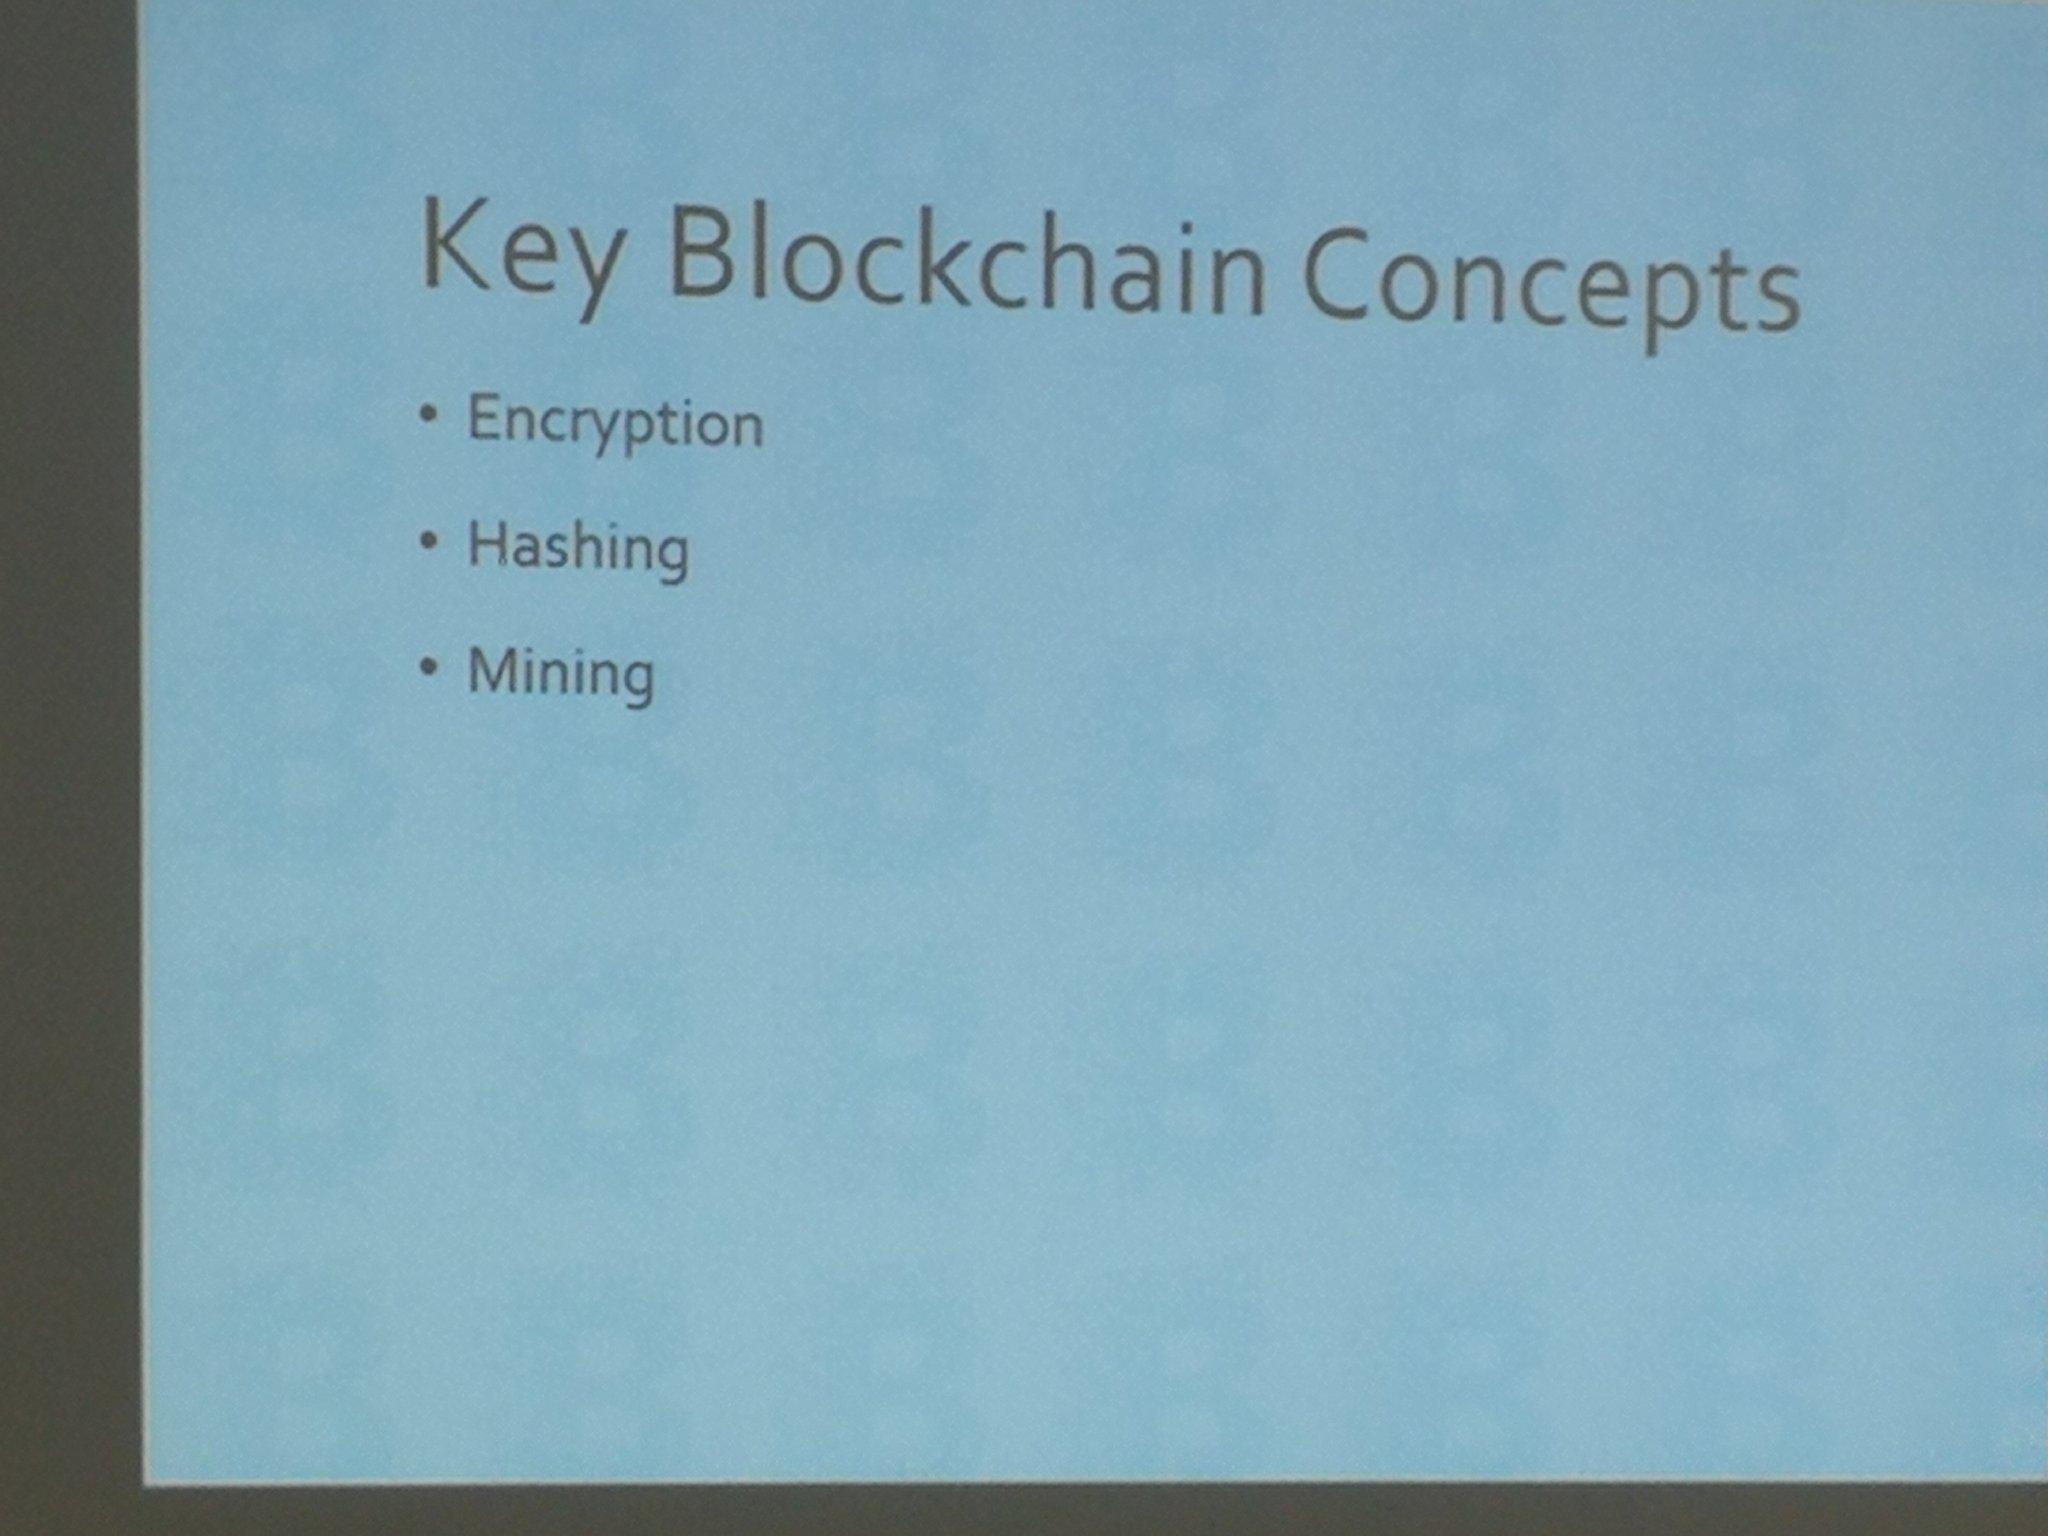 Key #blockchain concepts #netikx86 https://t.co/grDtSFhJXN